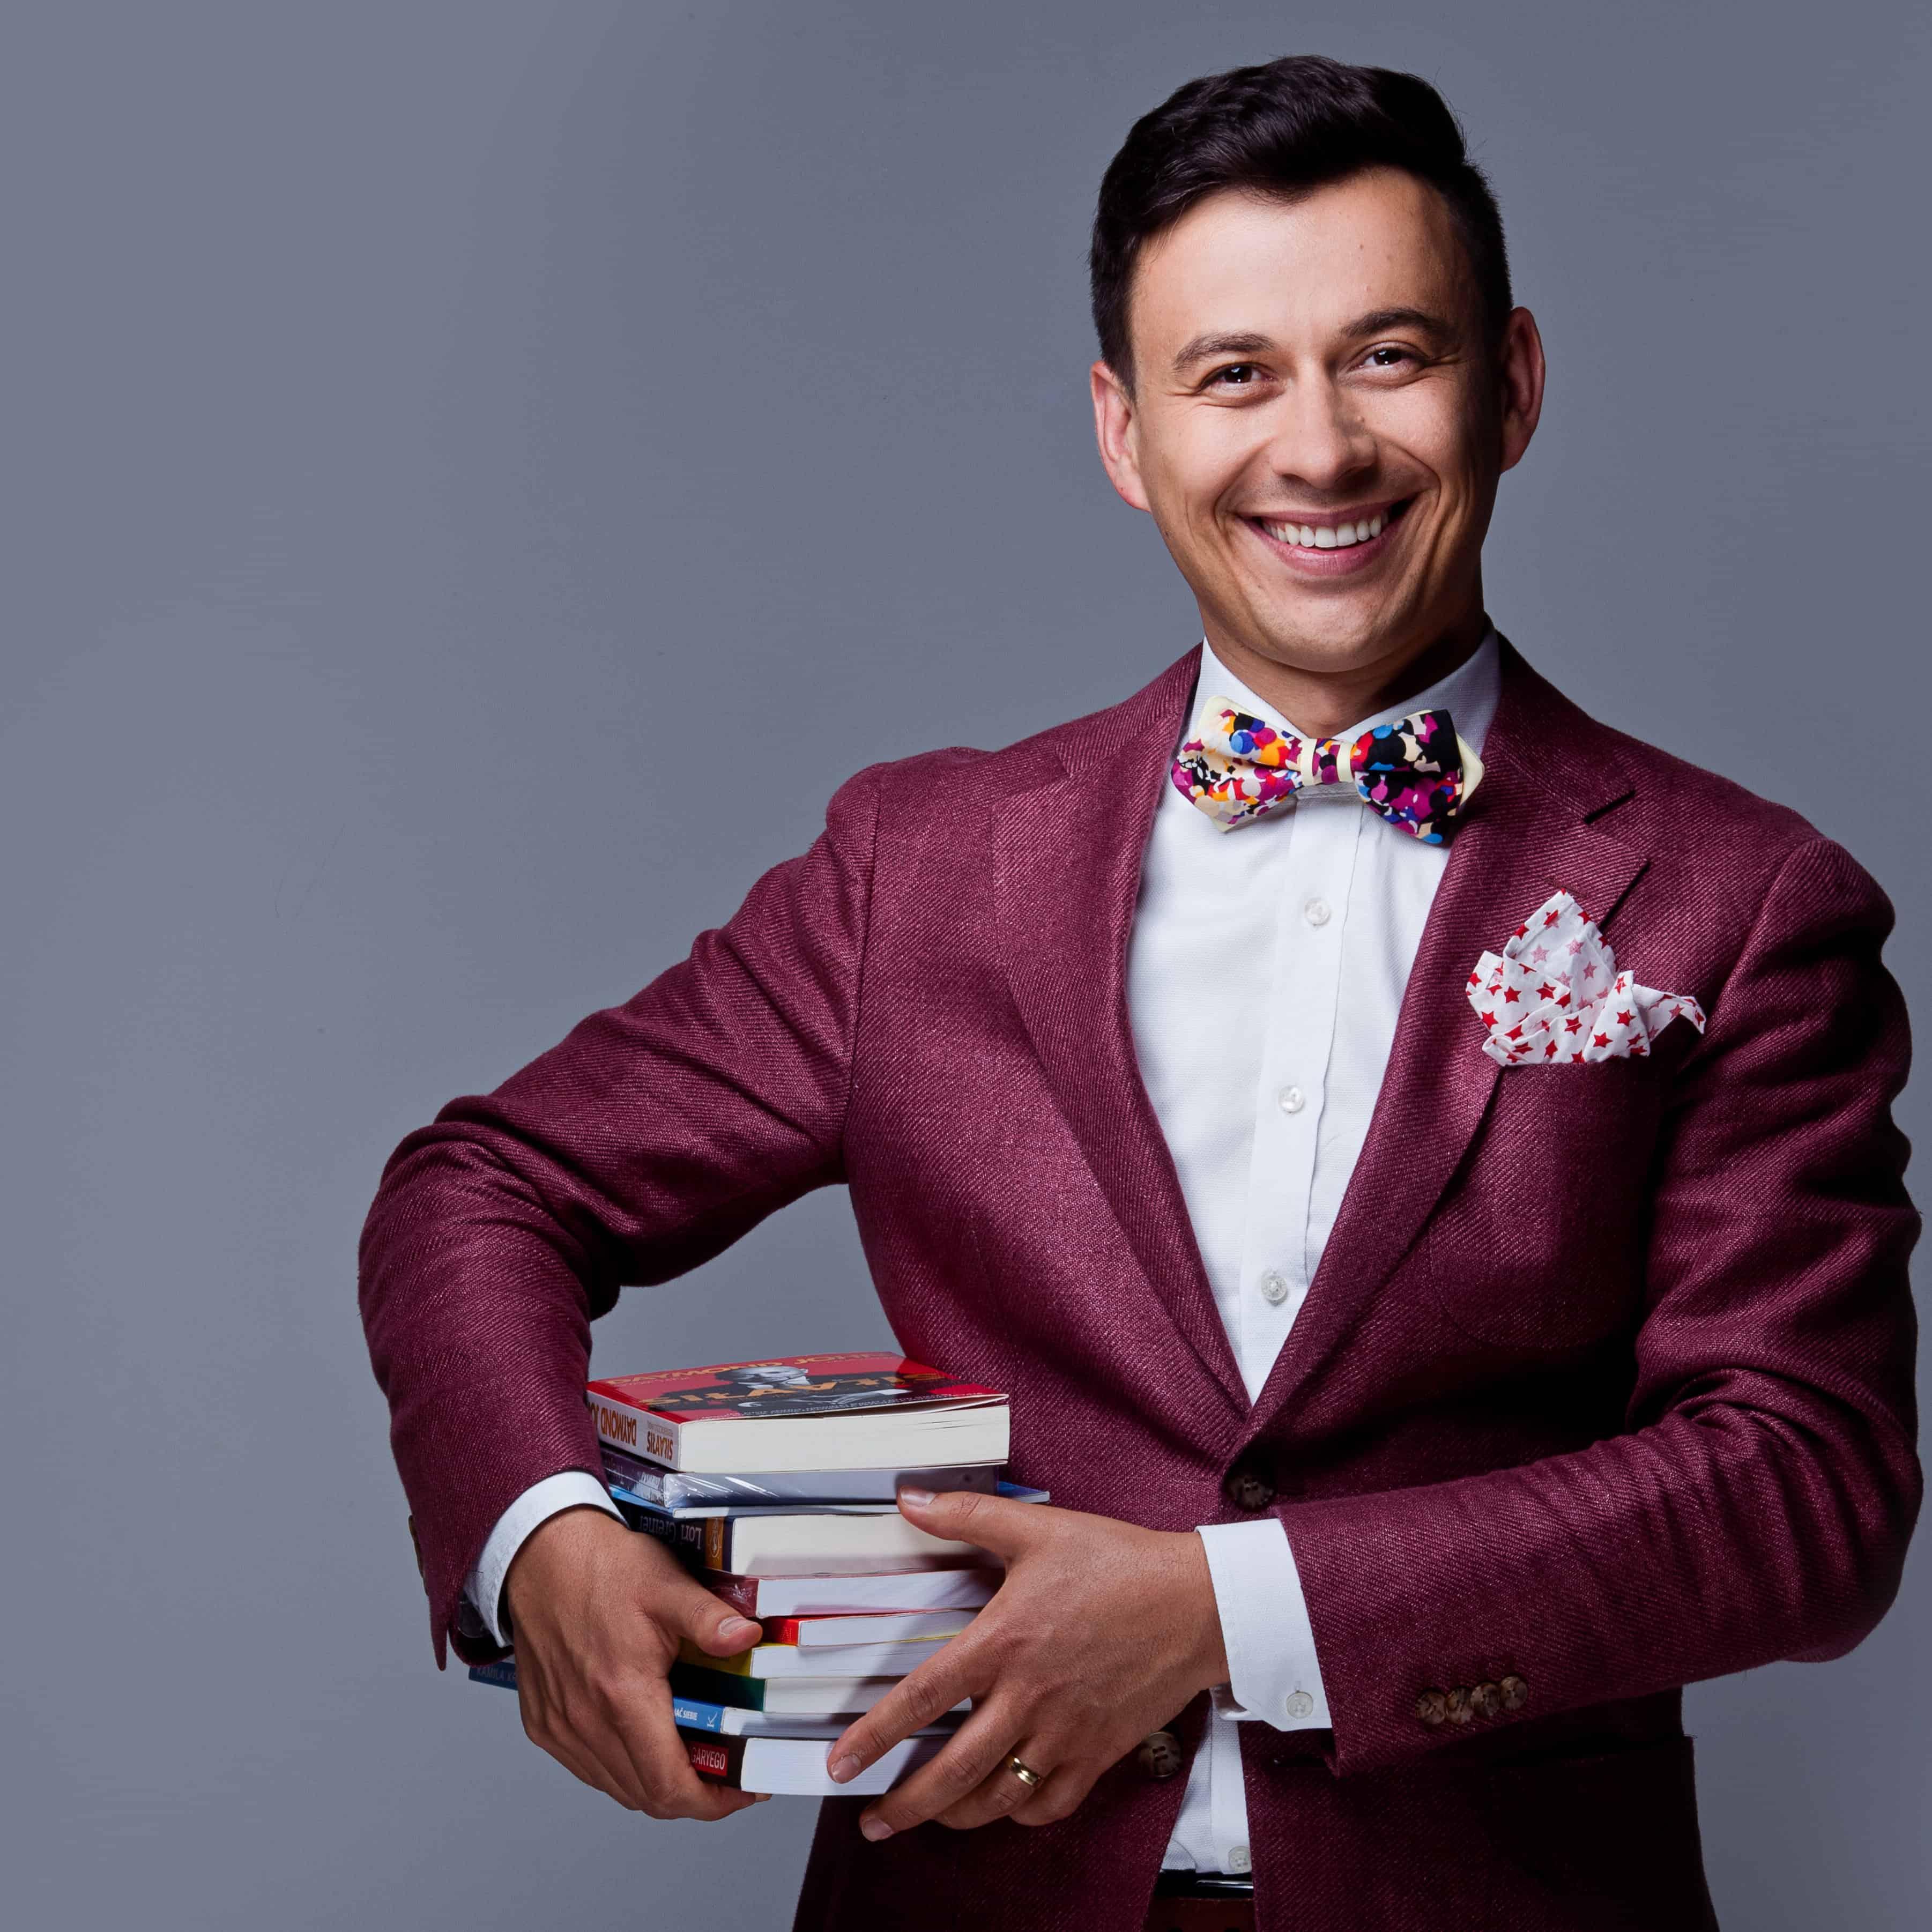 ExcellenceVale Marcin Osman